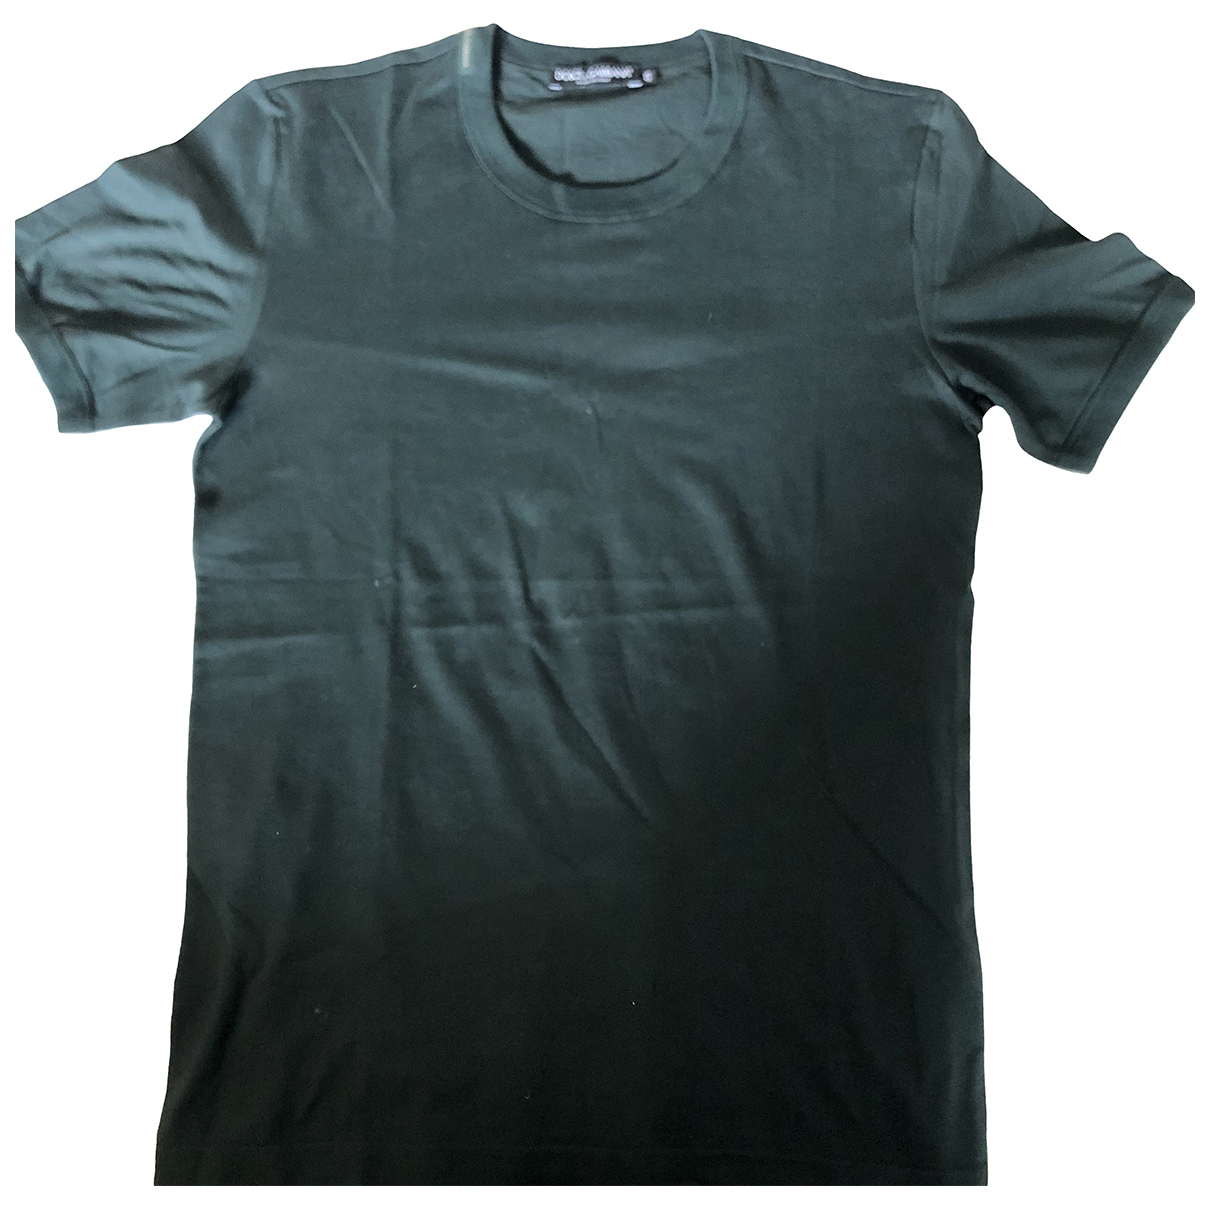 Dolce & Gabbana \N Green Cotton T-shirts for Men M International